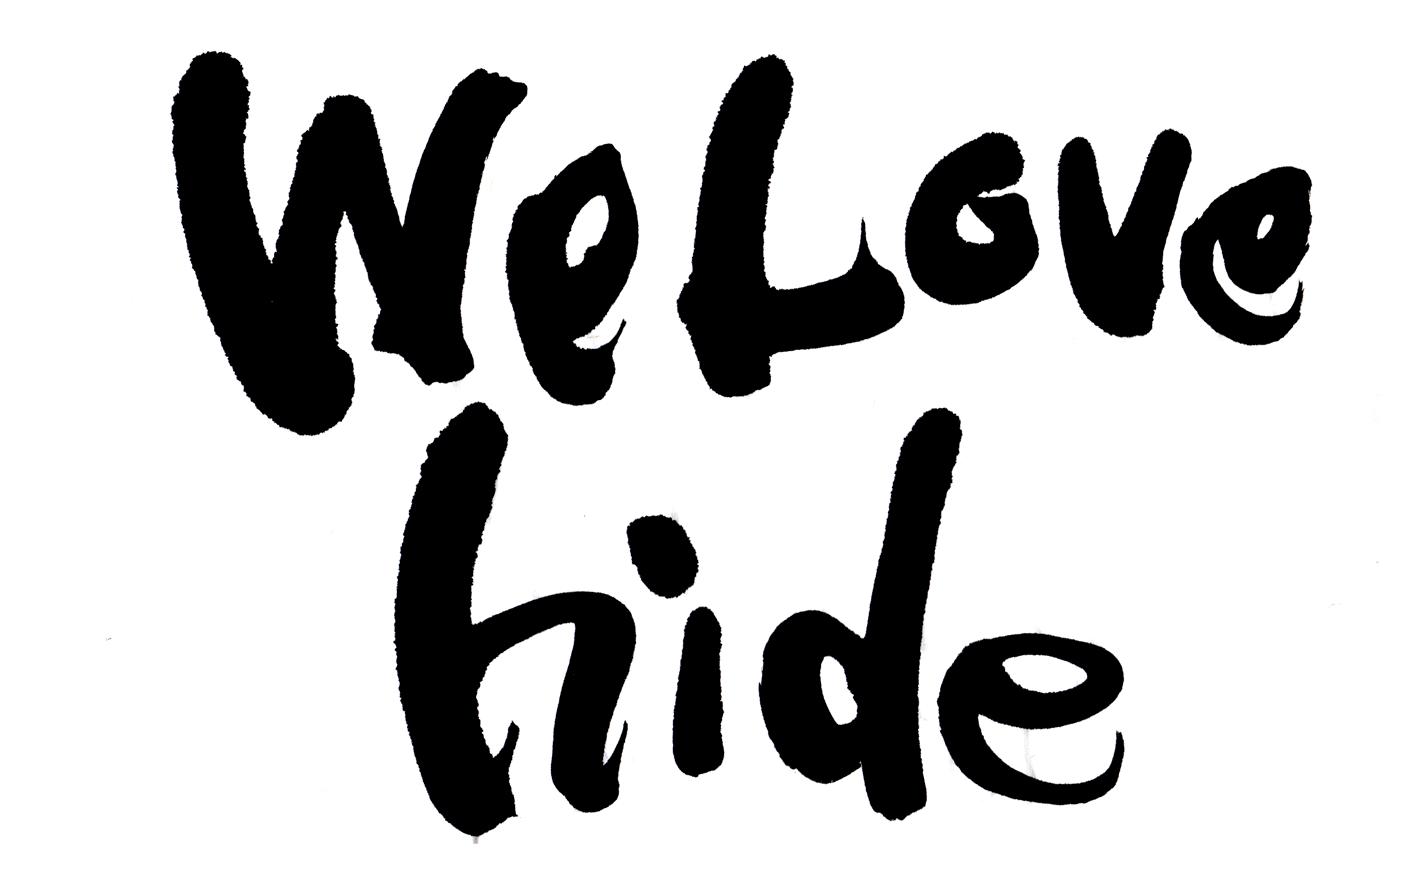 We Love hideと書いた筆文字